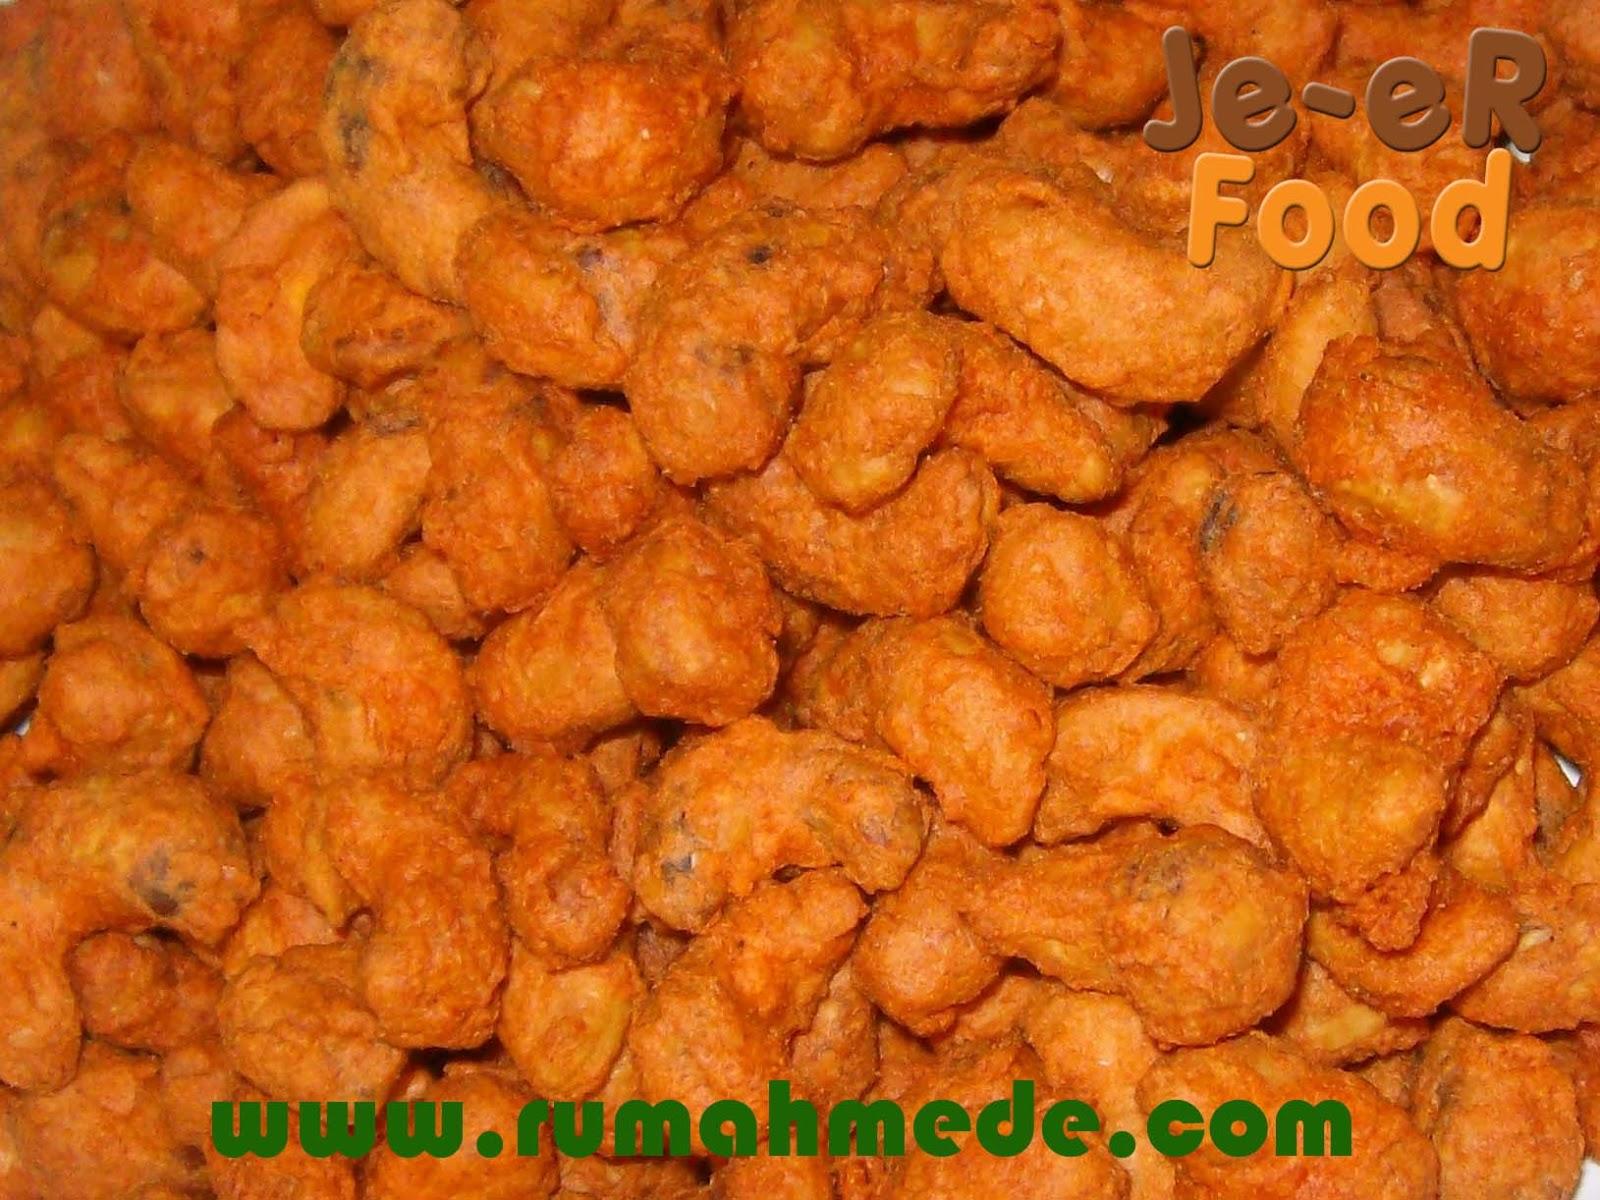 Supplier Kacang Mede Pedas 500gr Referensi Daftar Harga Mete Cashew Nut Utuh Balado Sambalado Premium 500 Gram Jual Grosir Di Depok Murah